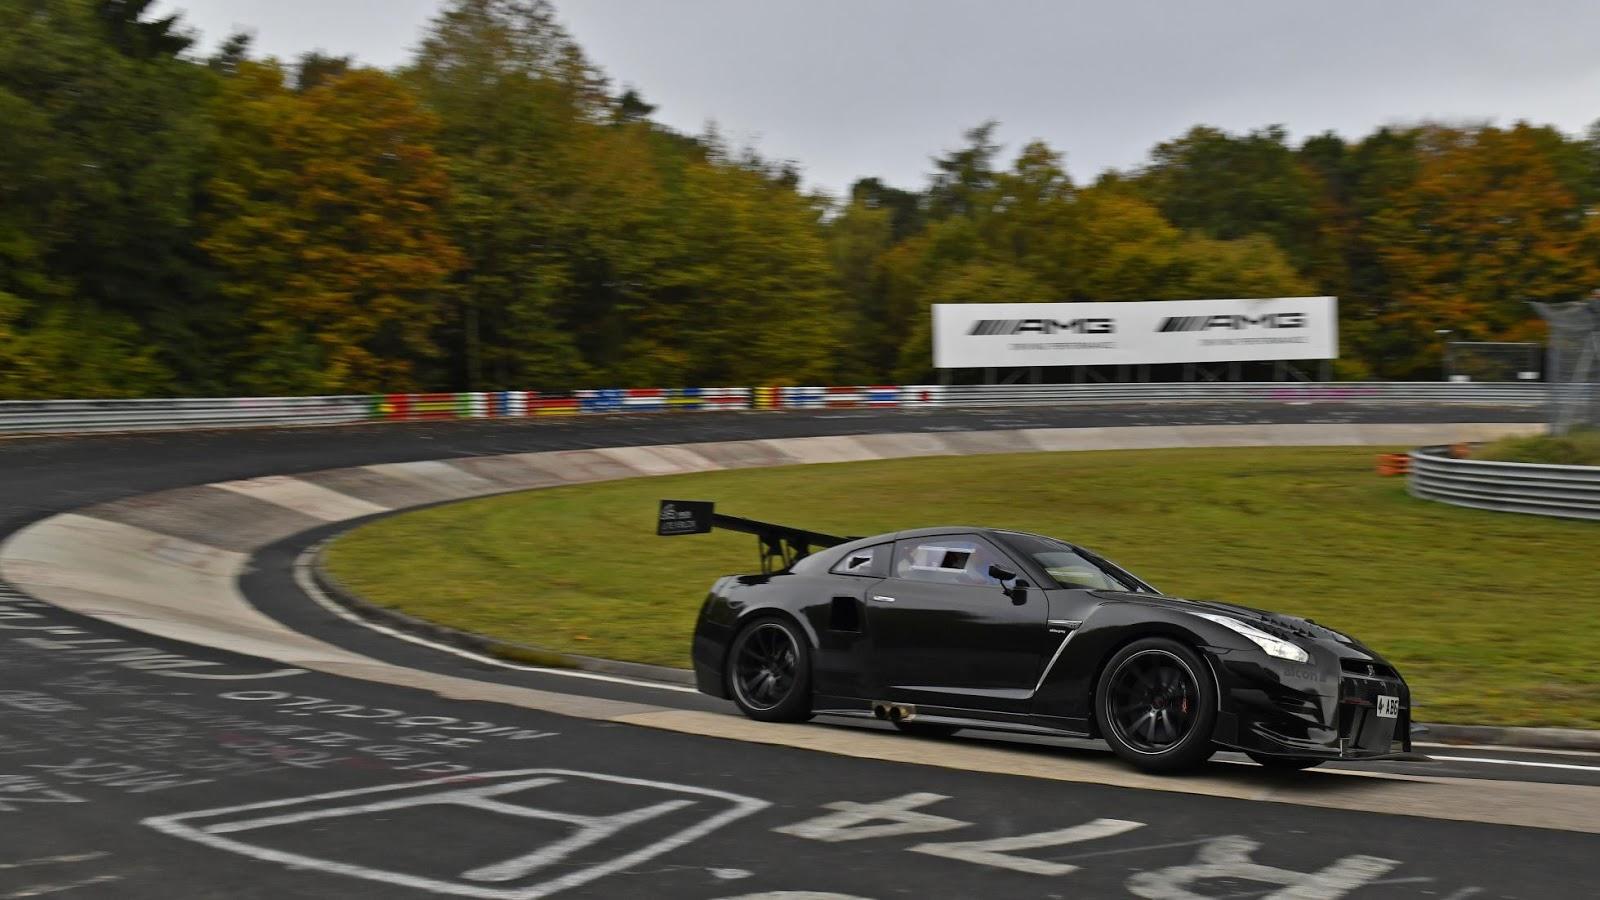 Litchfield-Nissan-GT-R-Nurburgring-26